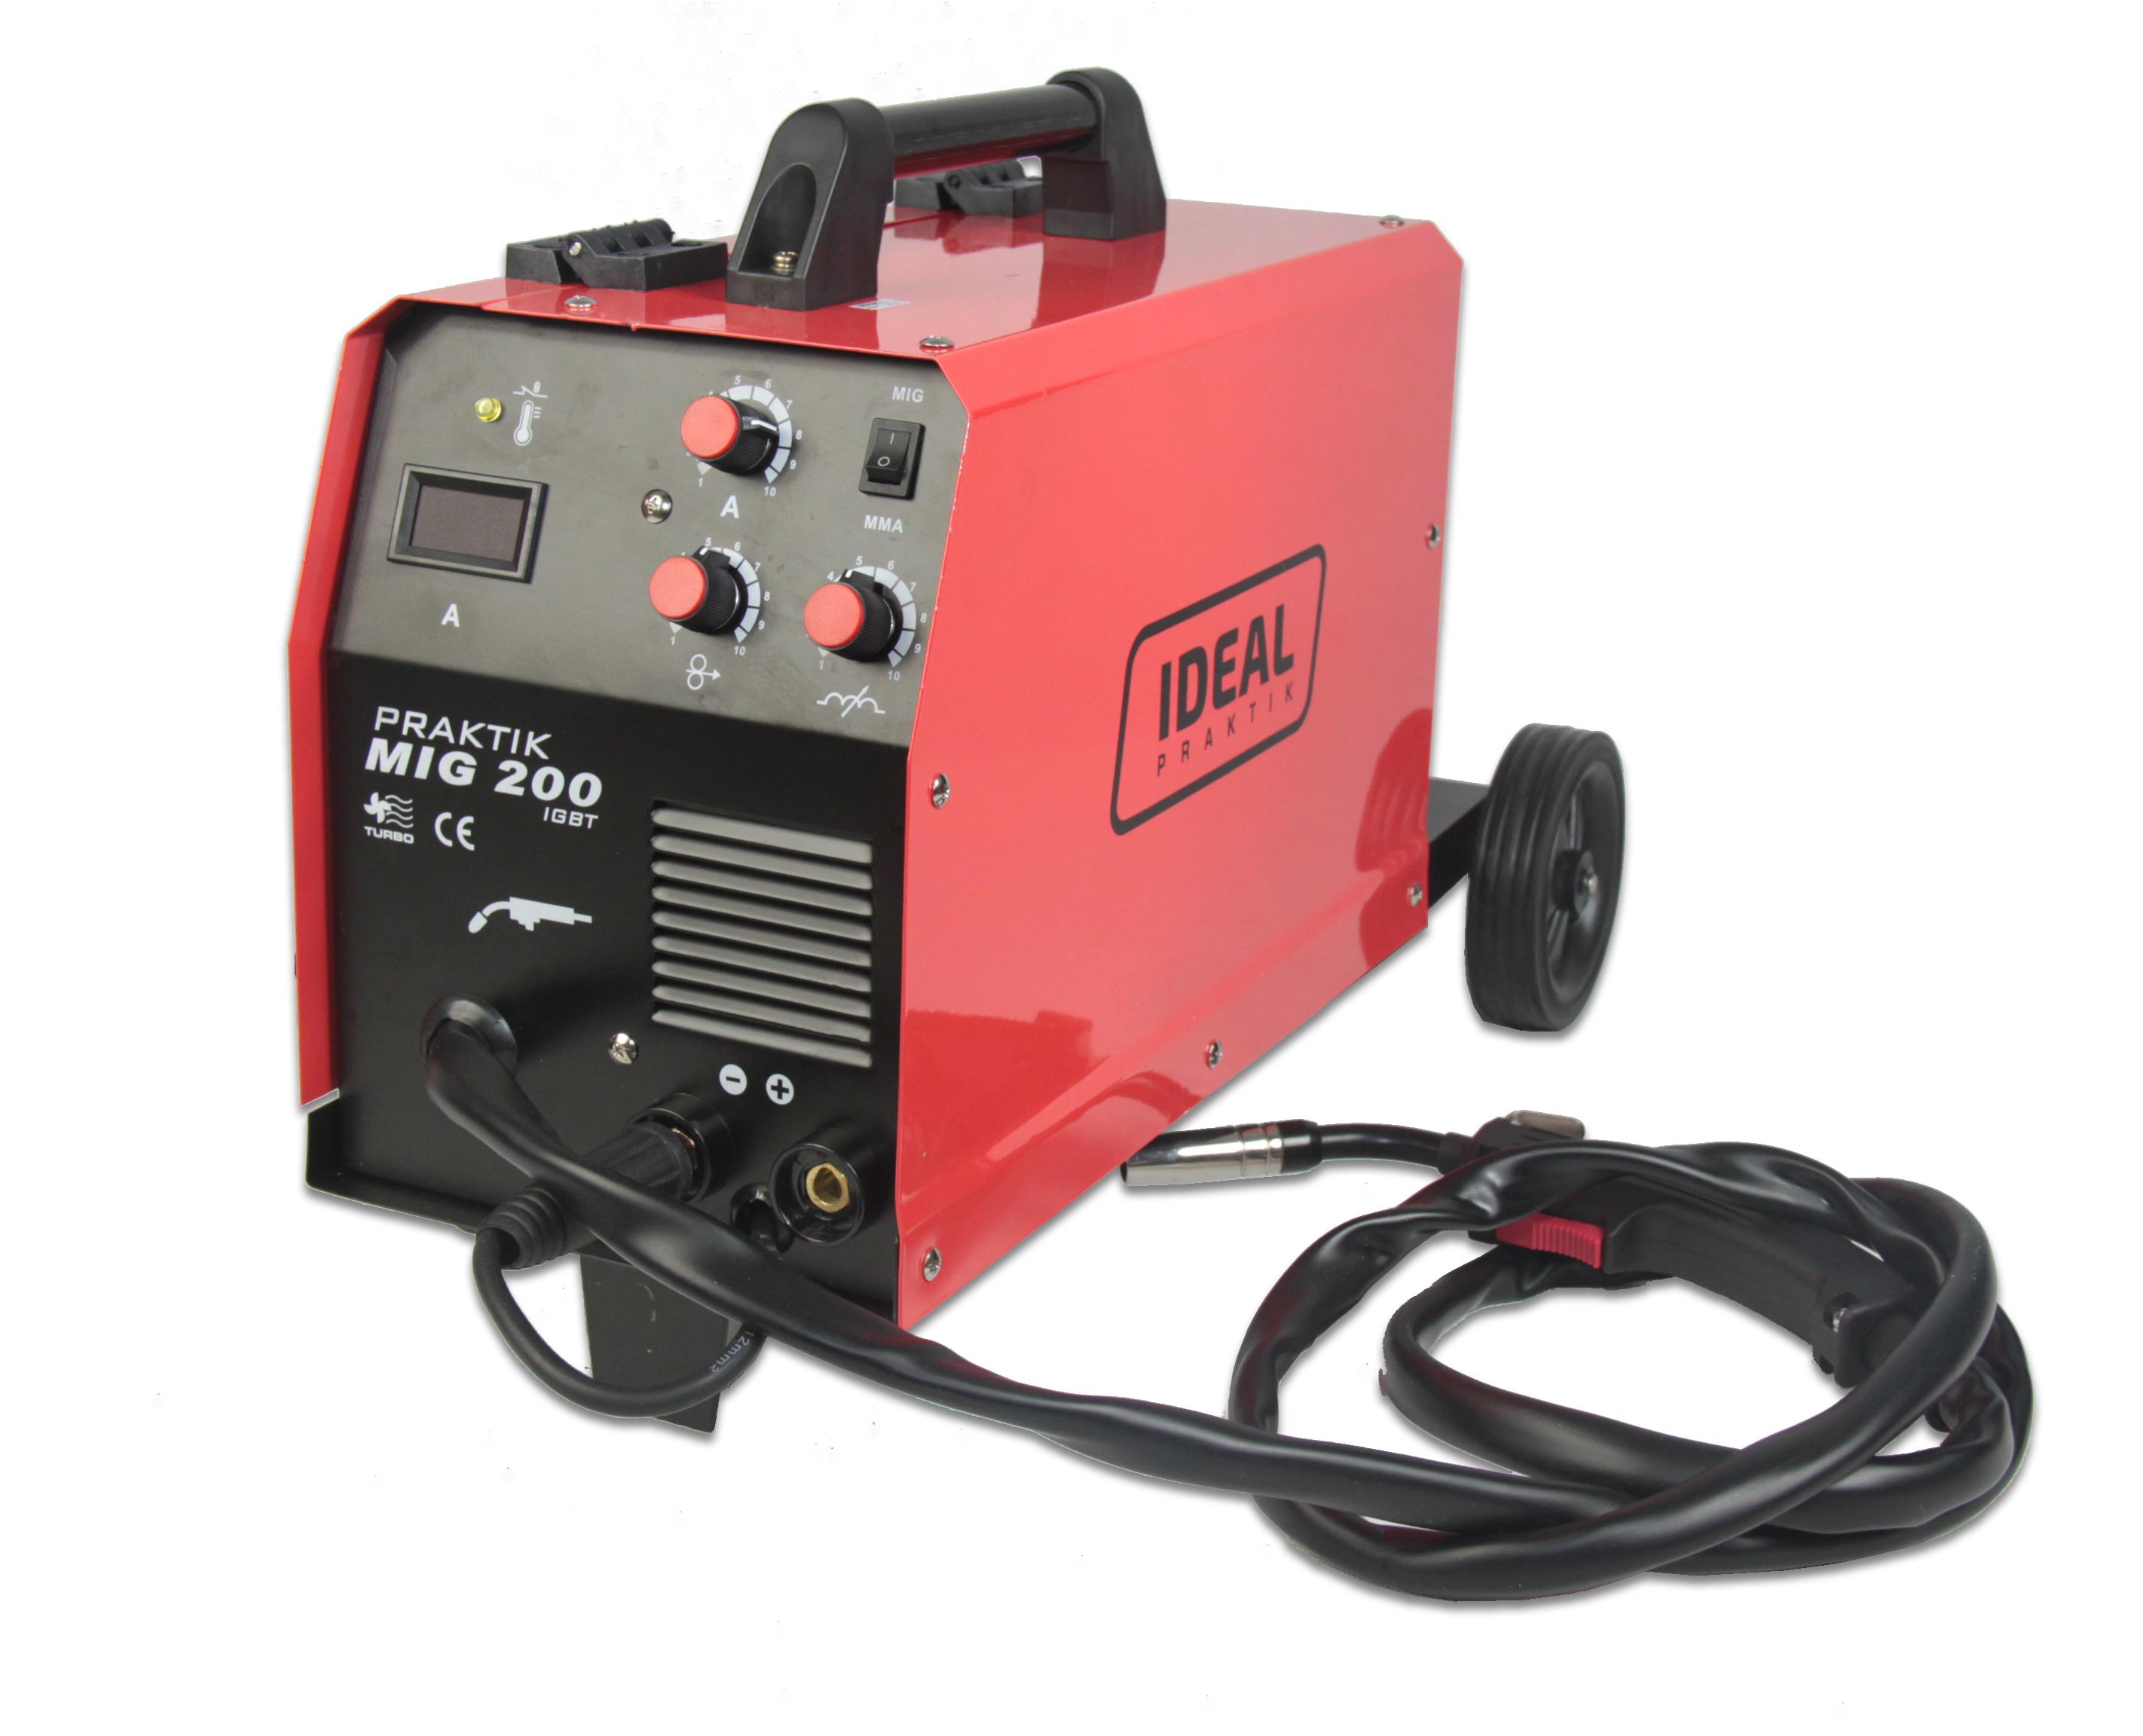 2483bcba56a Welding machine MIG 200Amp IDEAL PRAKTIK MIG 200 MMA, FCAW GASLESS ...